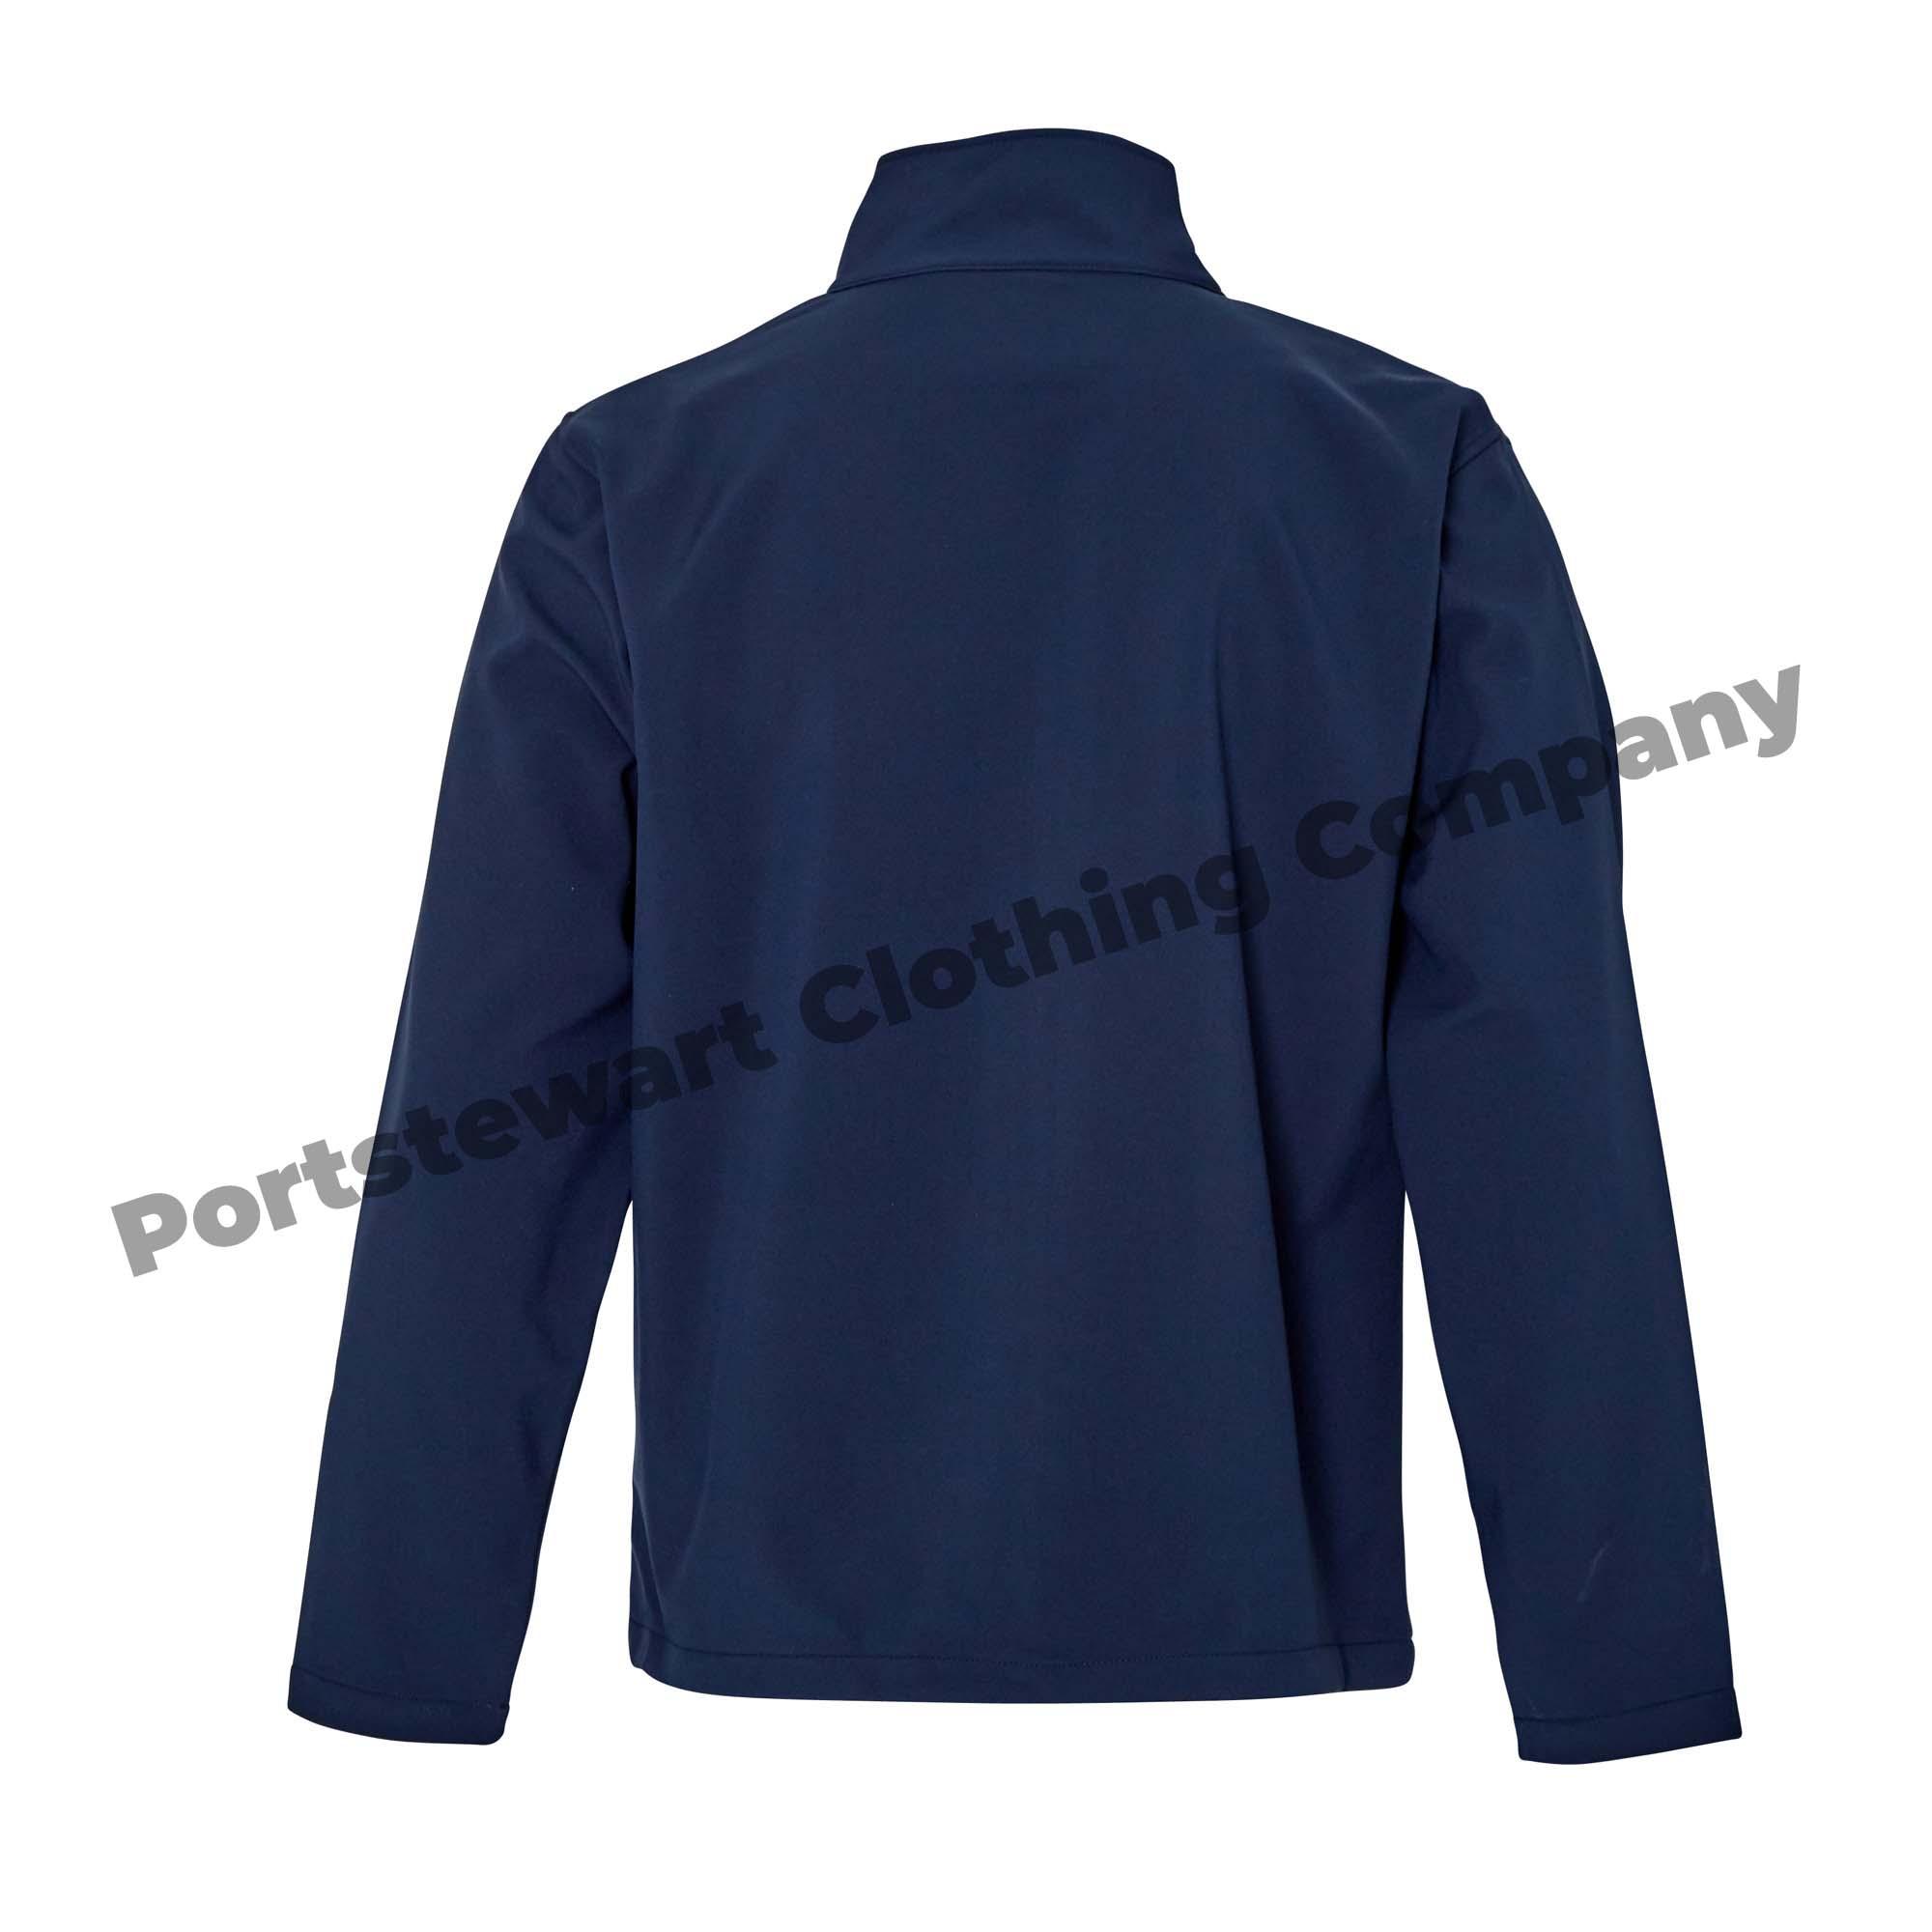 Regatta-Mens-Soft-Shell-Windproof-Workwear-Softshell-Jacket-Coat-RRP-50 thumbnail 10